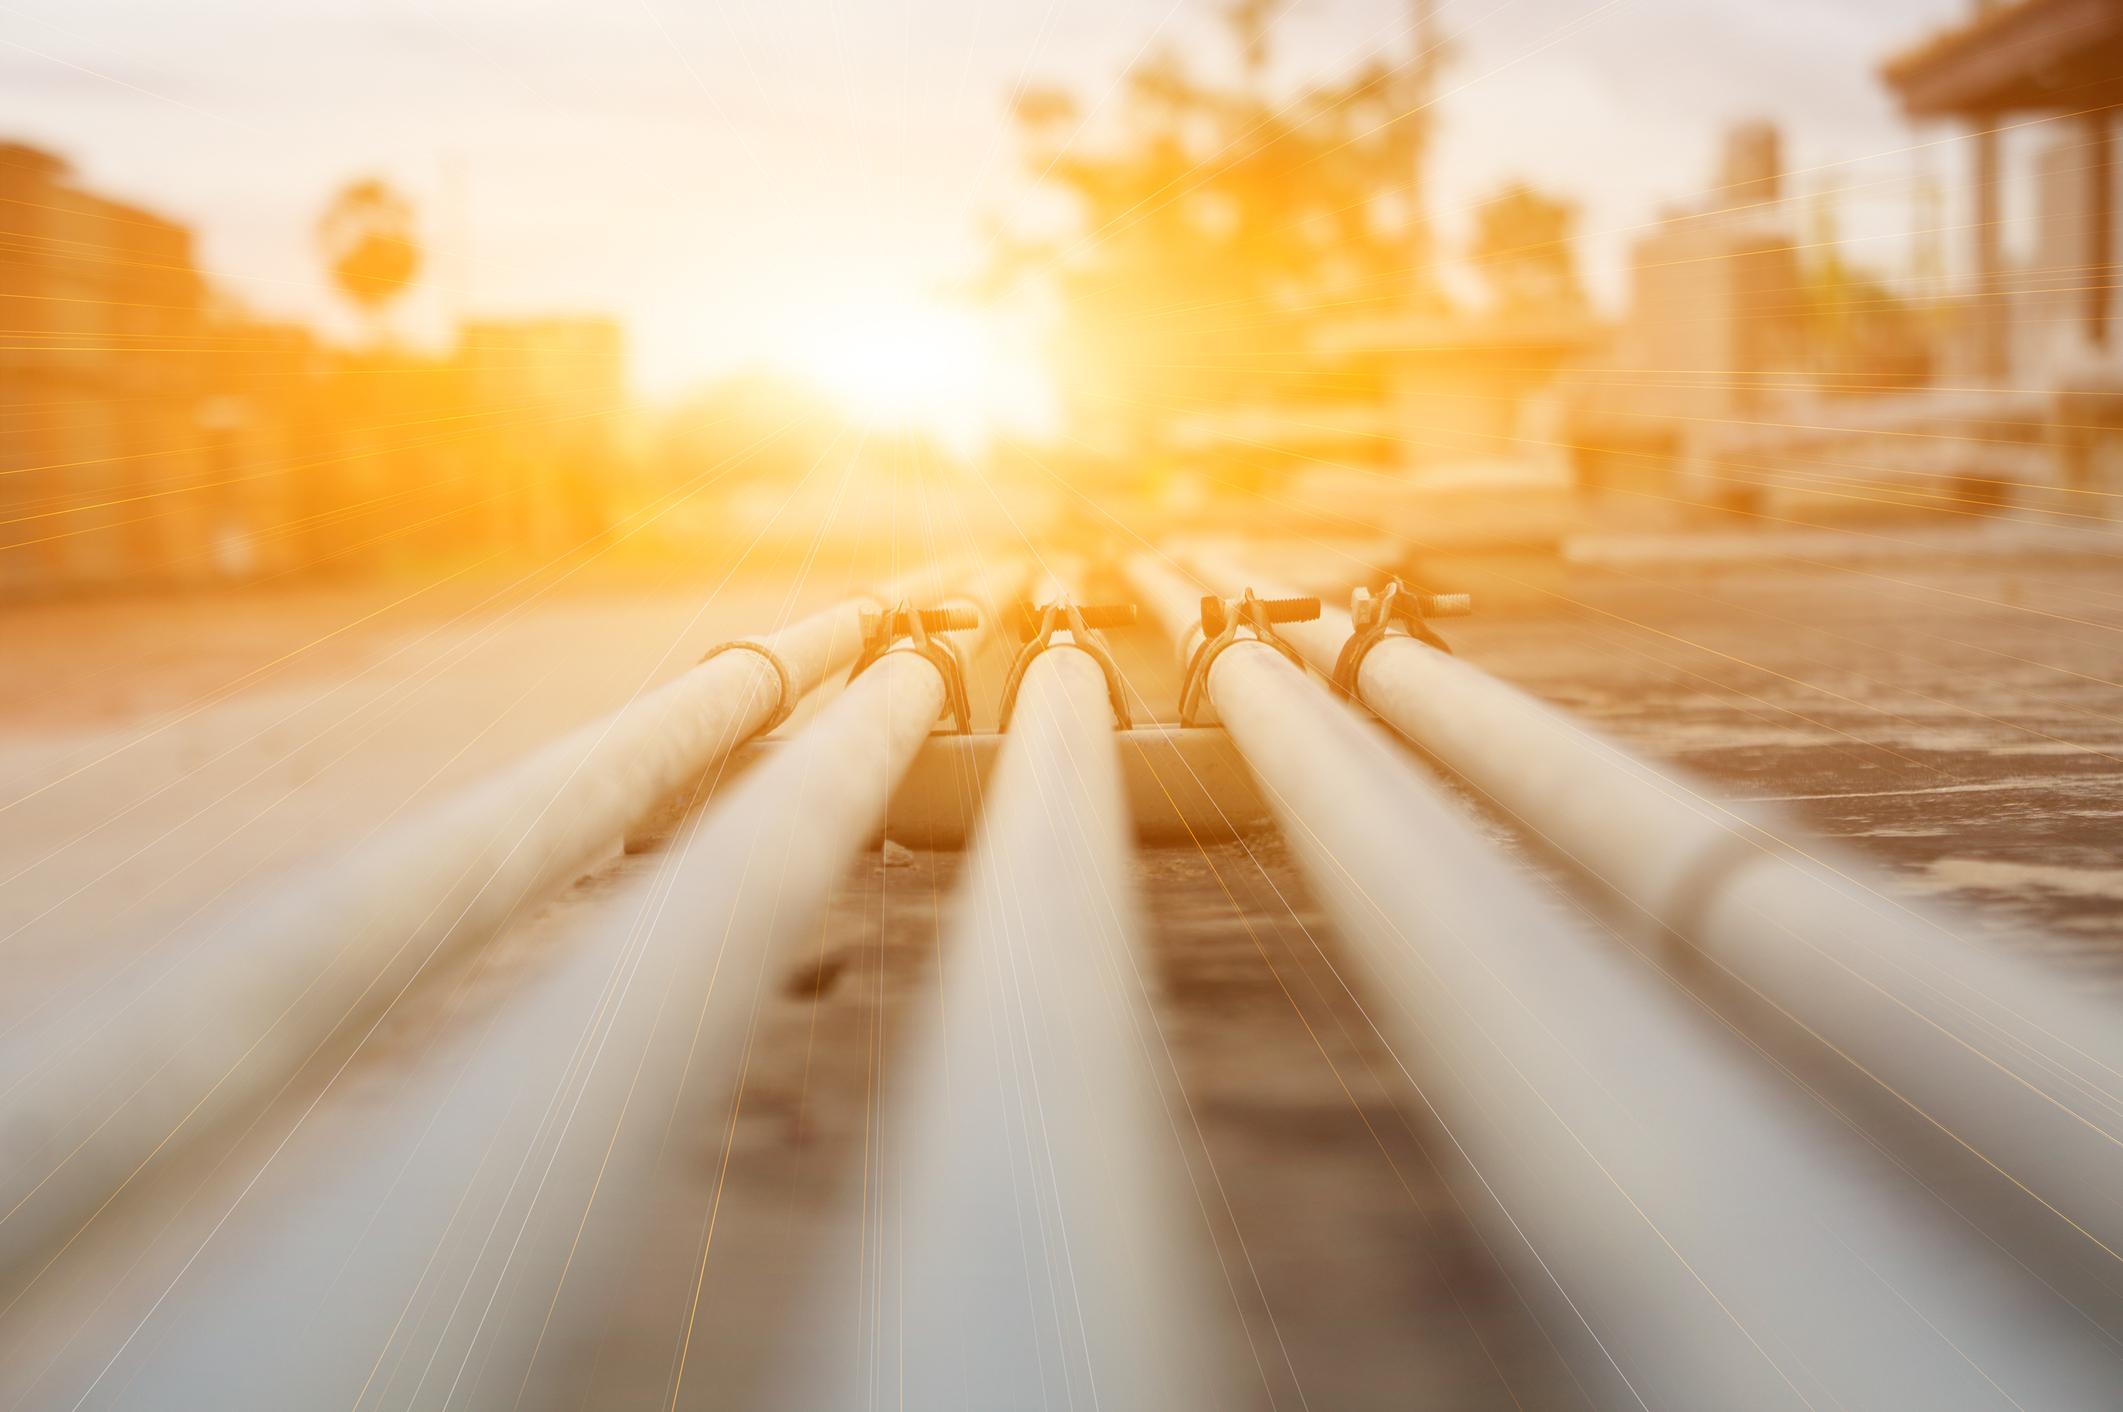 A burst of sunlight shining on a pipeline